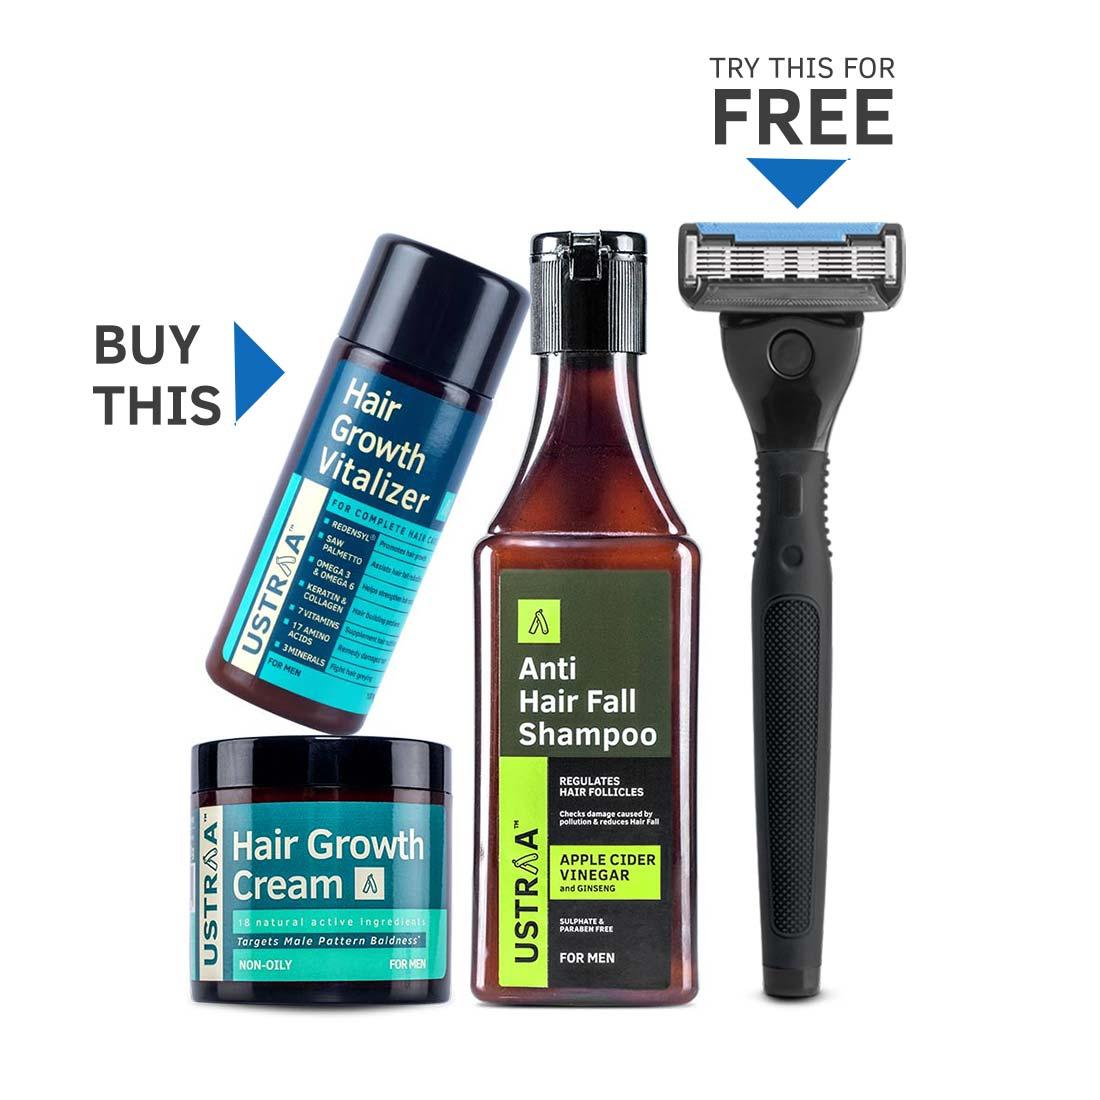 Hair Growth Kit (Get Ustraa 5 Blade Razor Free)